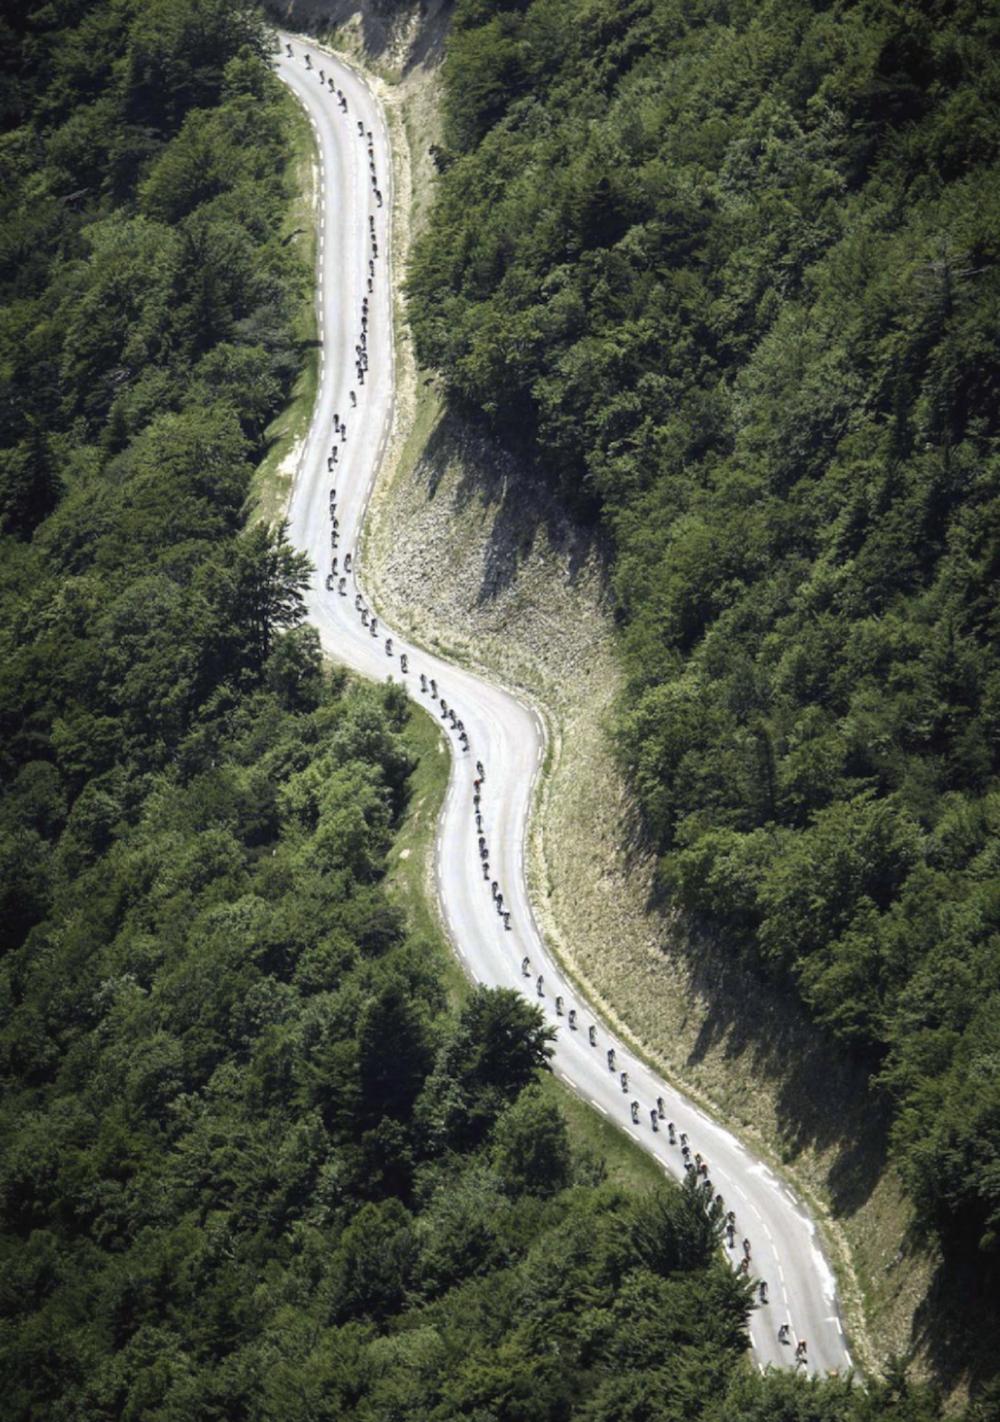 ...eine Luftaufnahme bei der Dauphiné Libéré, dem Vorbereitungsrennen zur Tour de France.